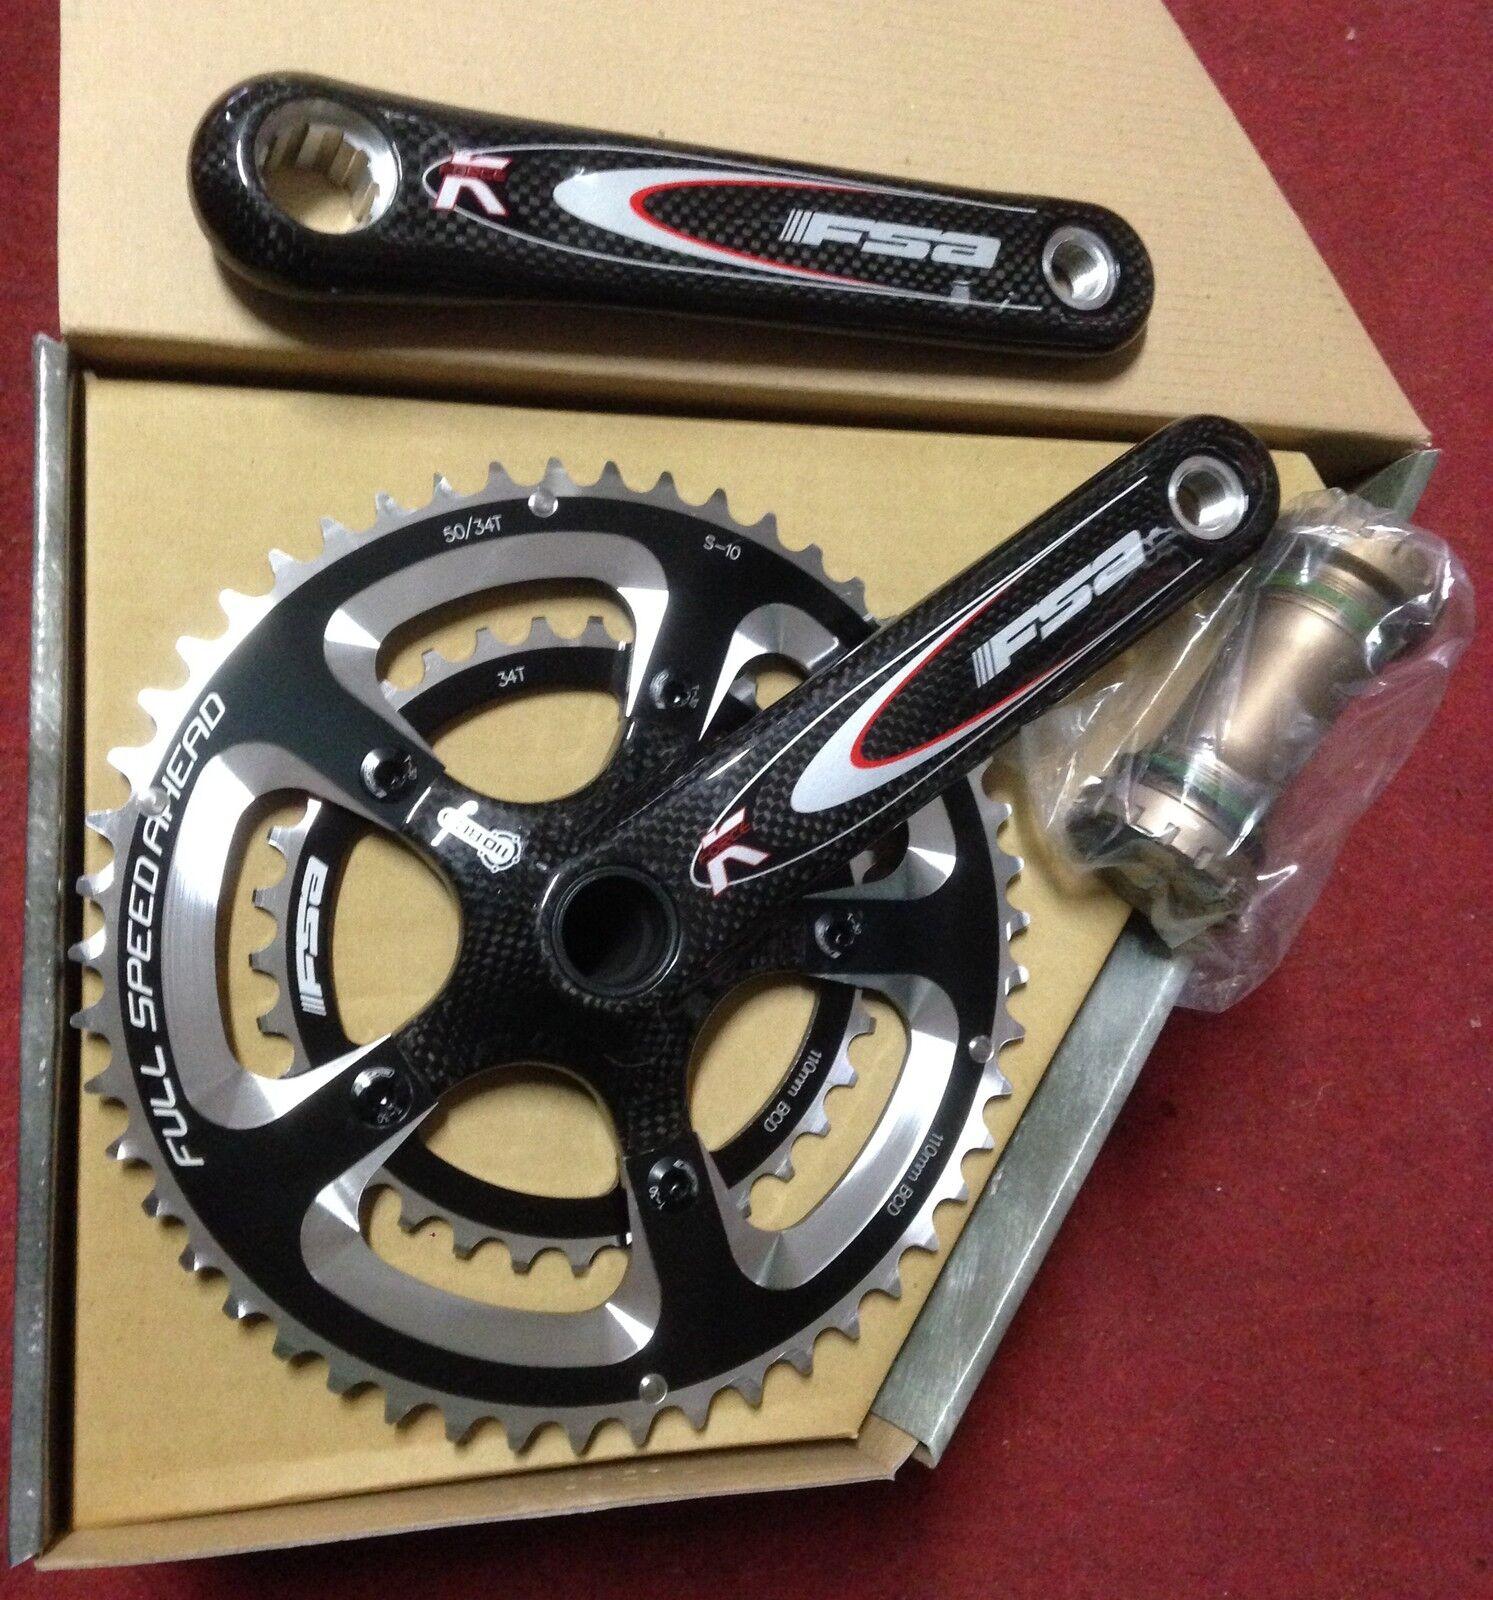 Kurbelgarnitur Fahrrad Fsa K-Kraft Megaexo Compact 50-34 170 Crankset Road 10s